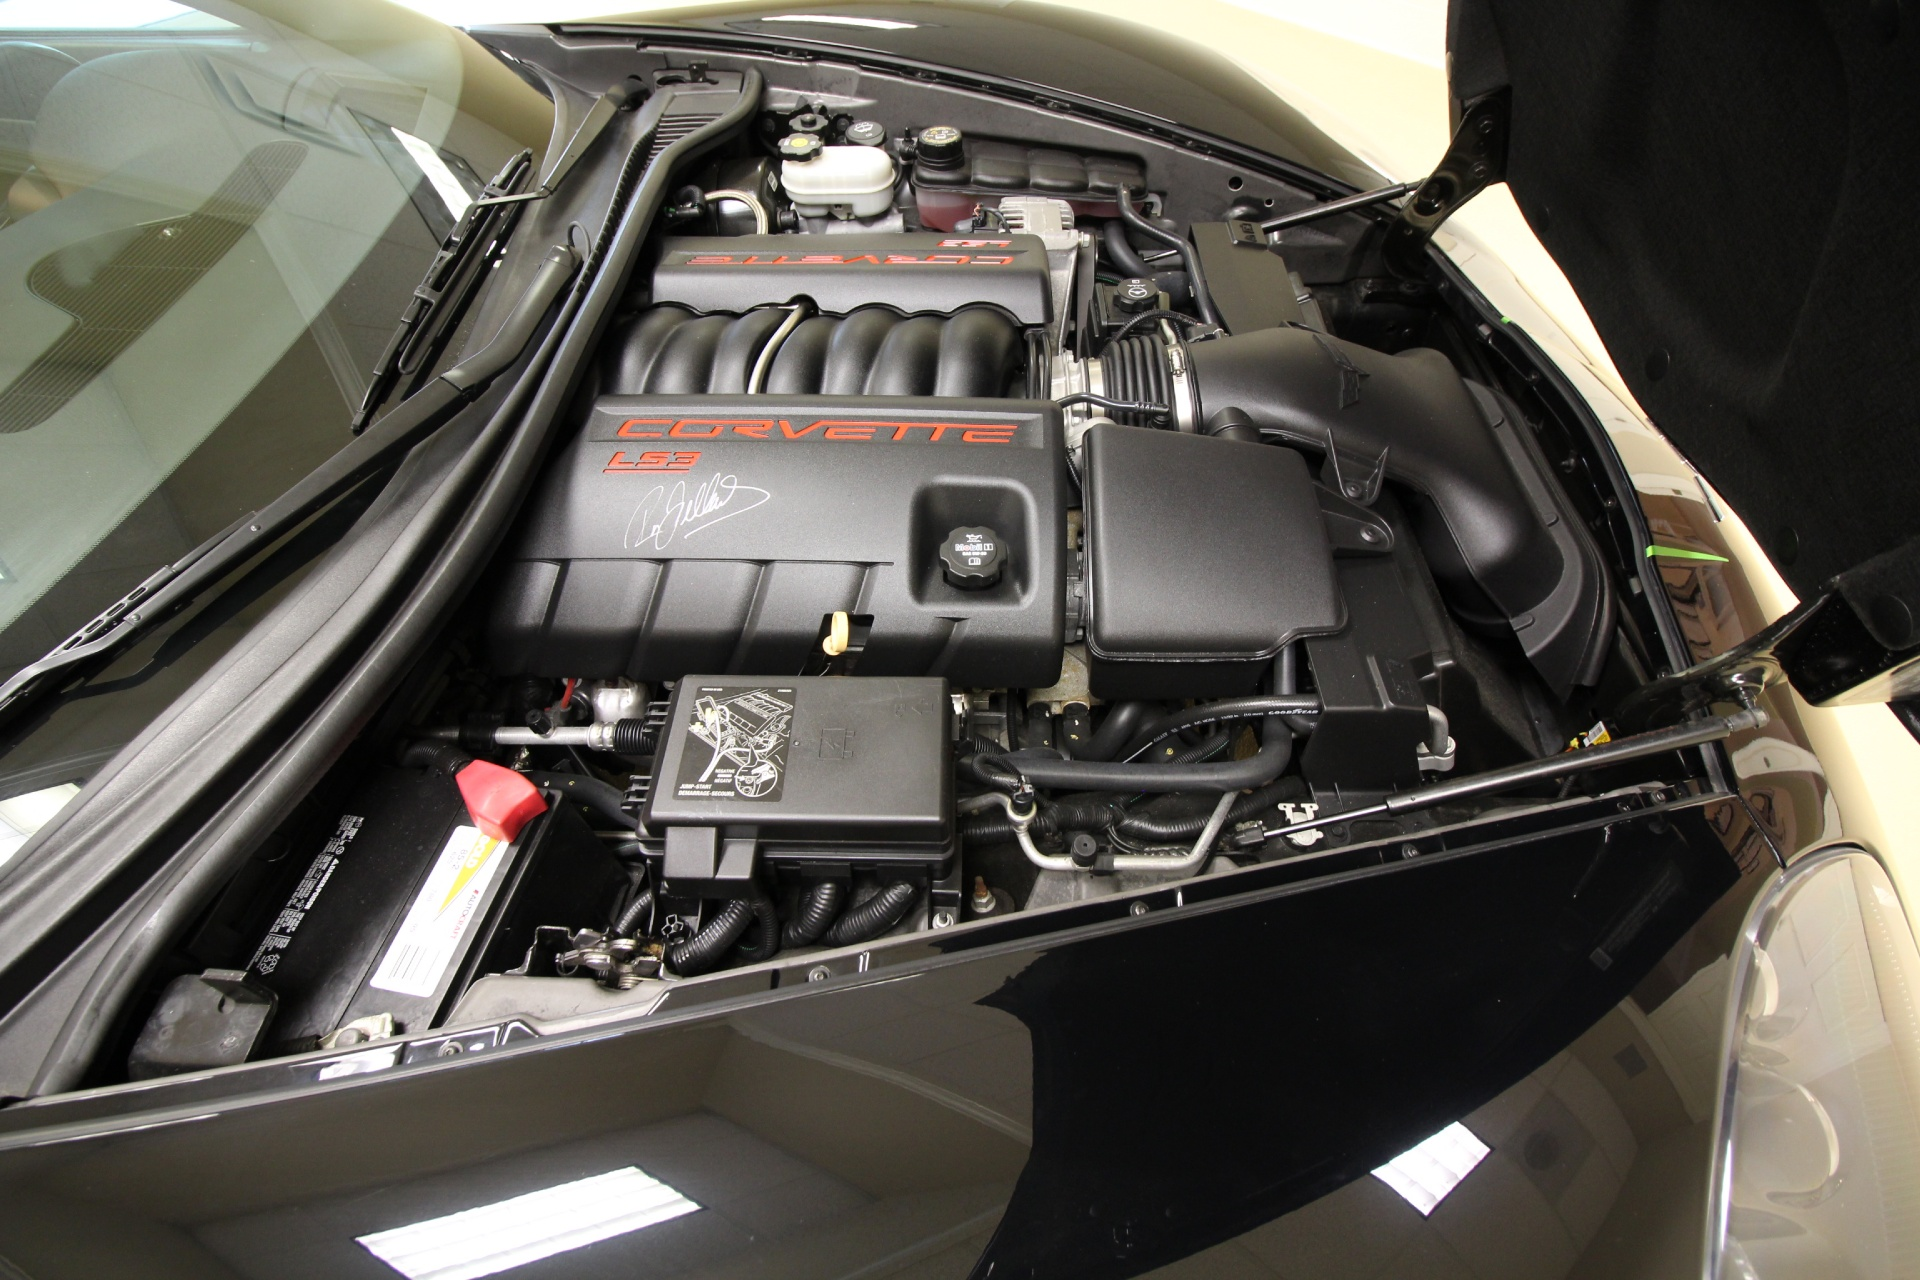 Used 2008 Chevrolet Corvette Indy 500 Pace Car Replica EMERSON FITIPALDI EDITION | Albany, NY